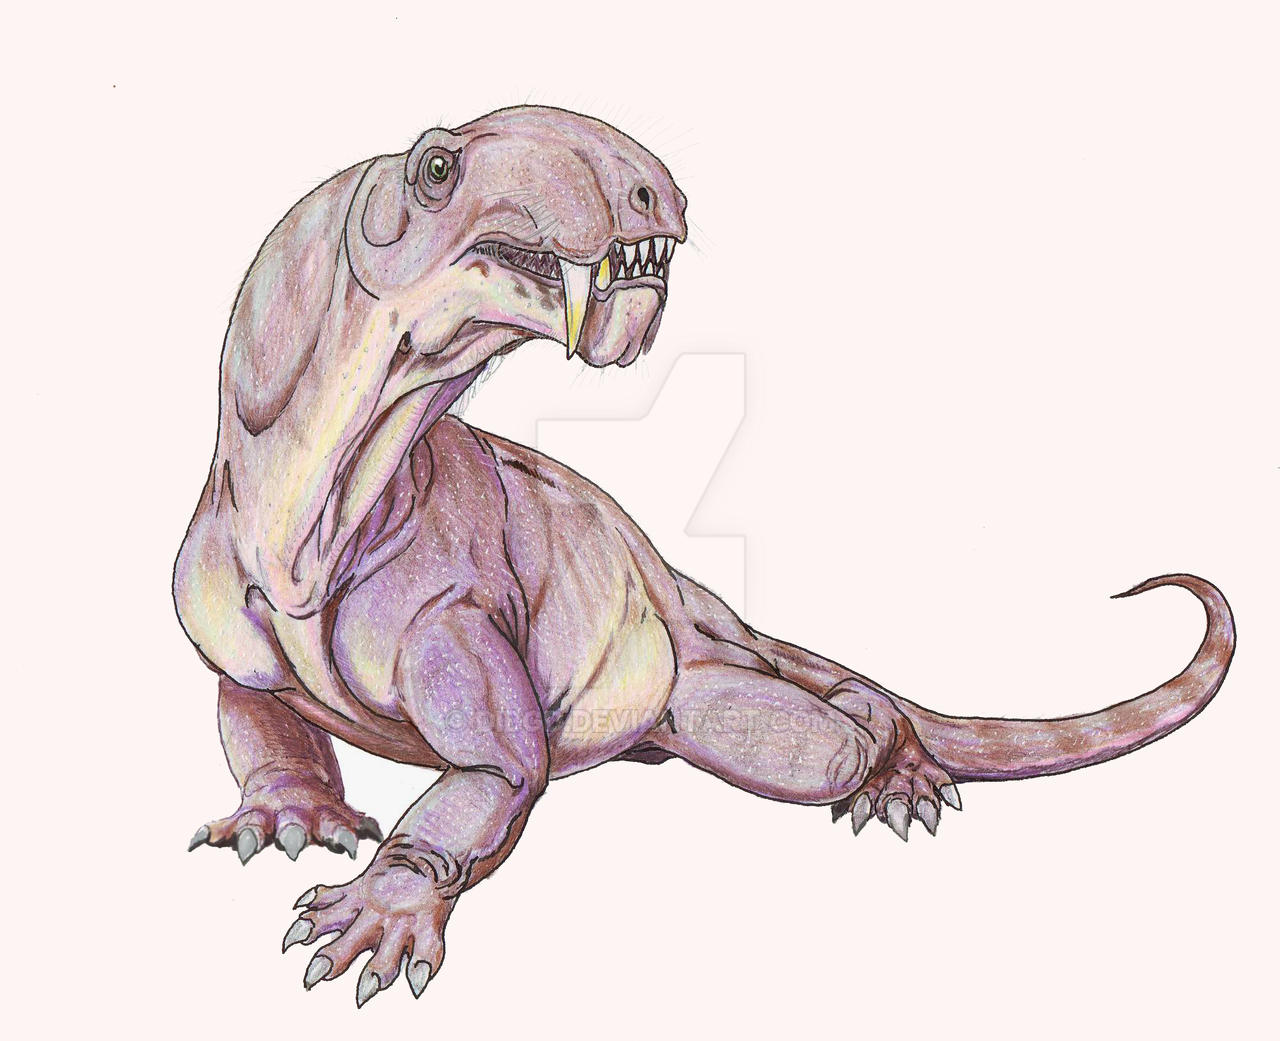 Ivantosaurus ensifer